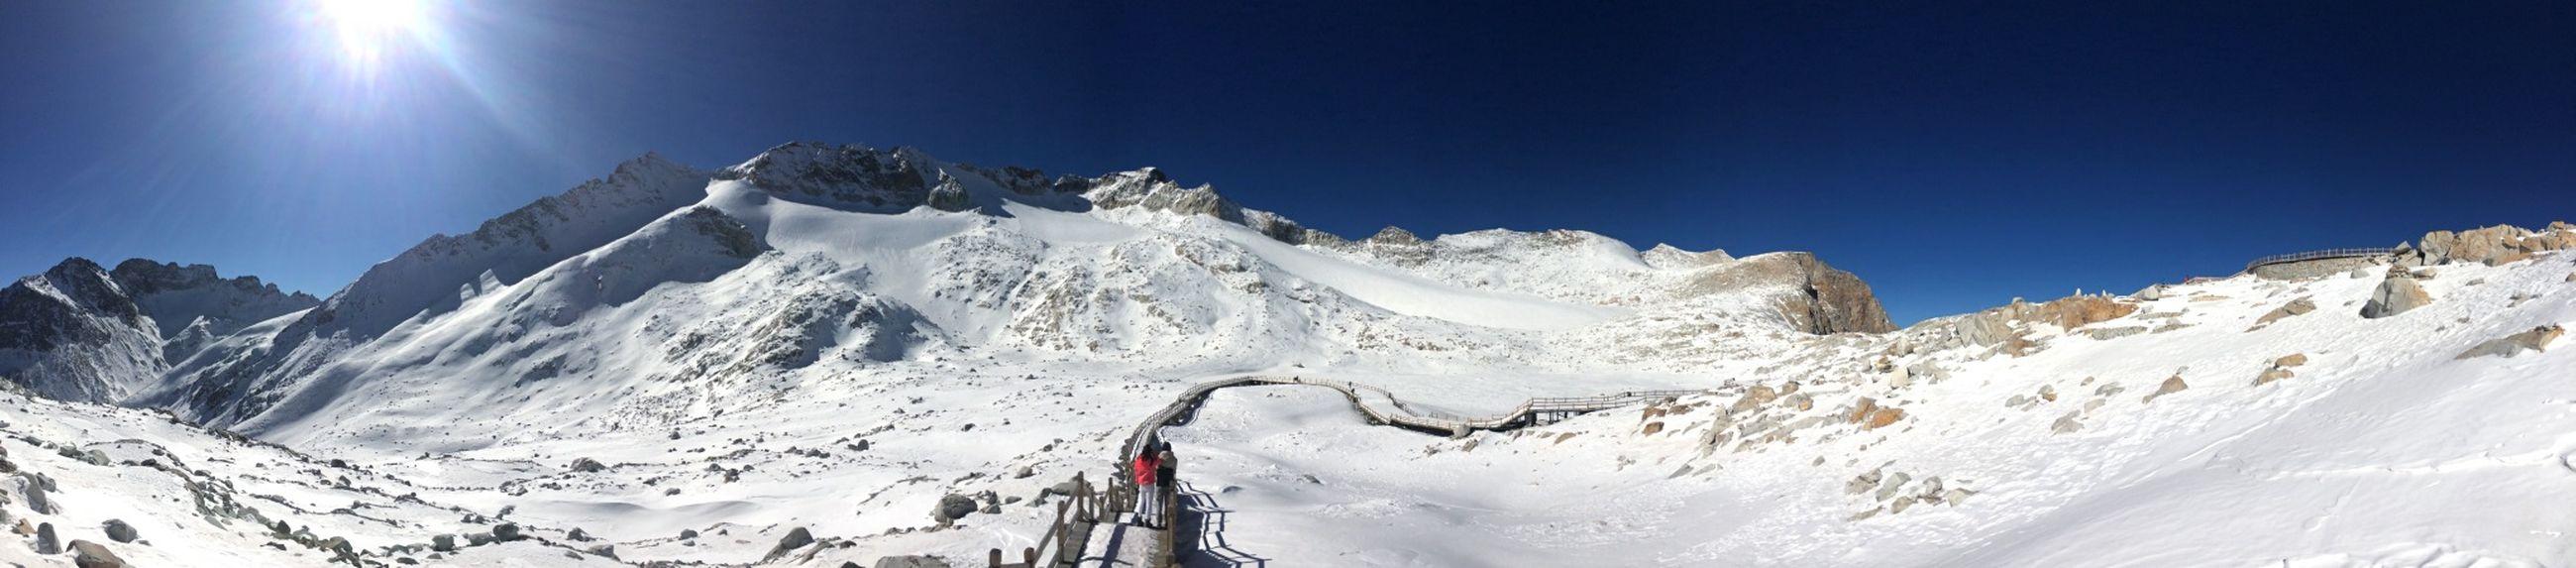 Mountain High Altitude Enjoying Life